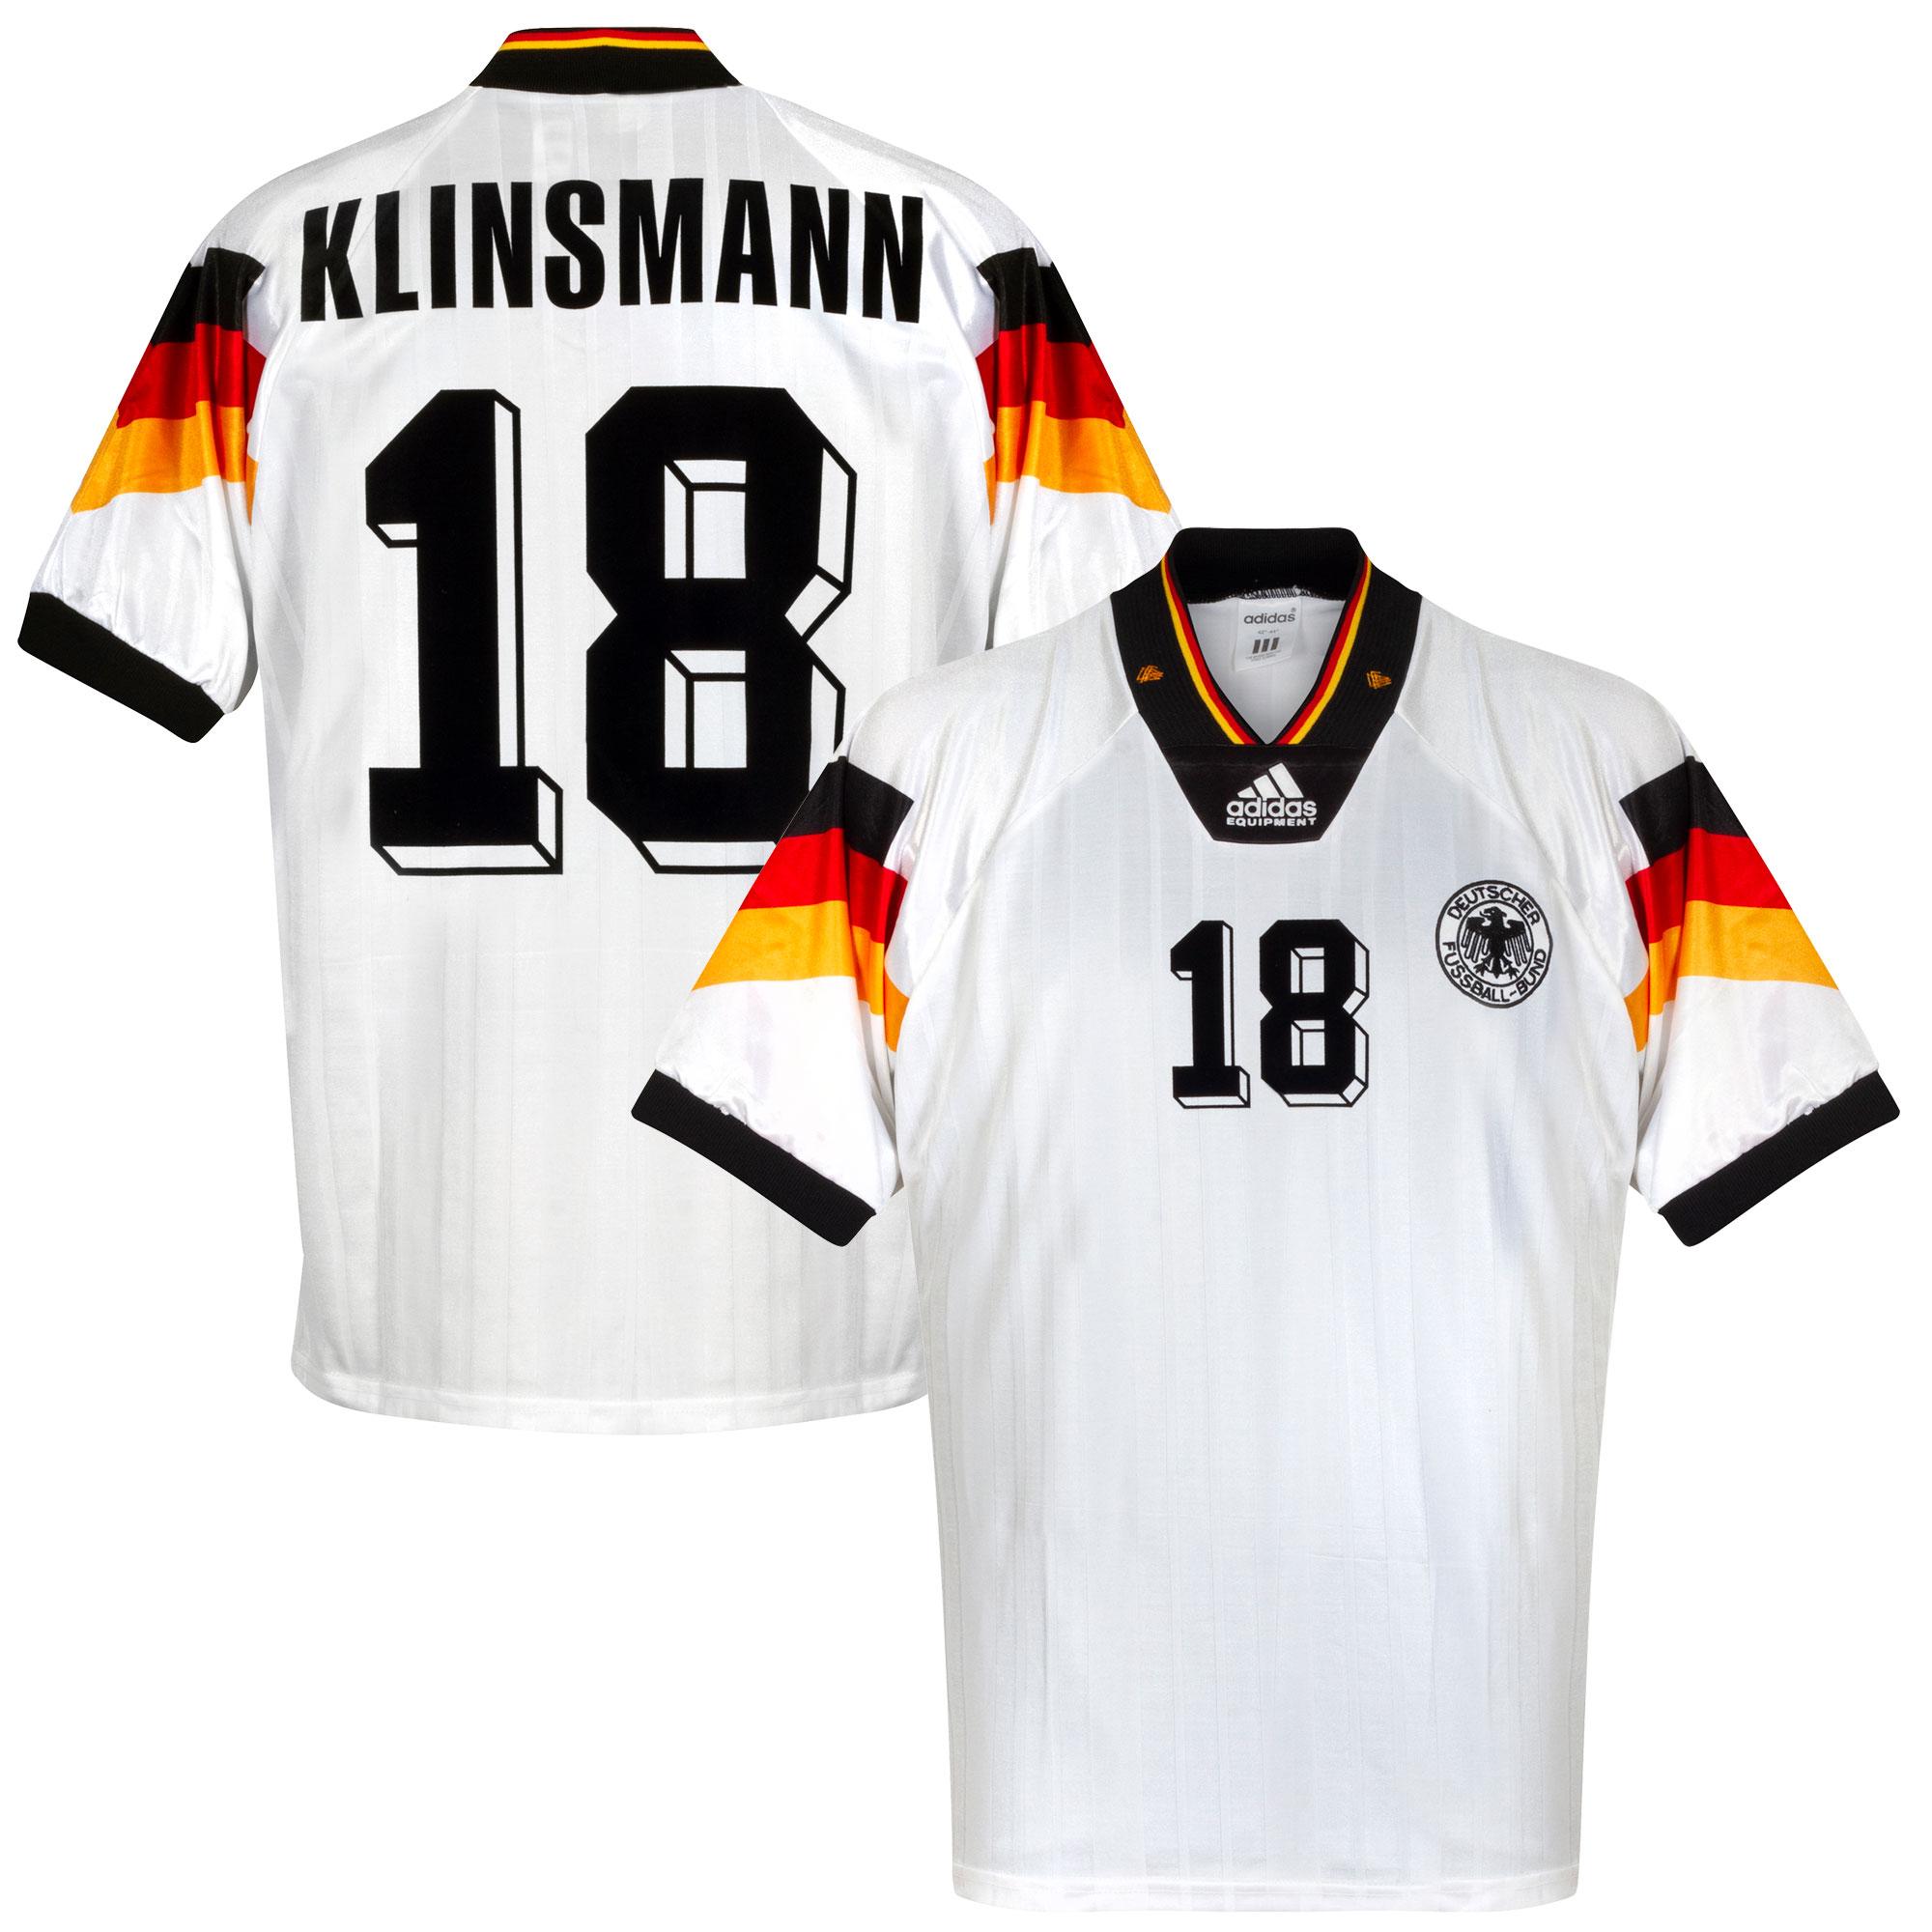 adidas Germany 1992-1994 Home Klinsmann 18 Shirt - USED Condition (Good) - Size L